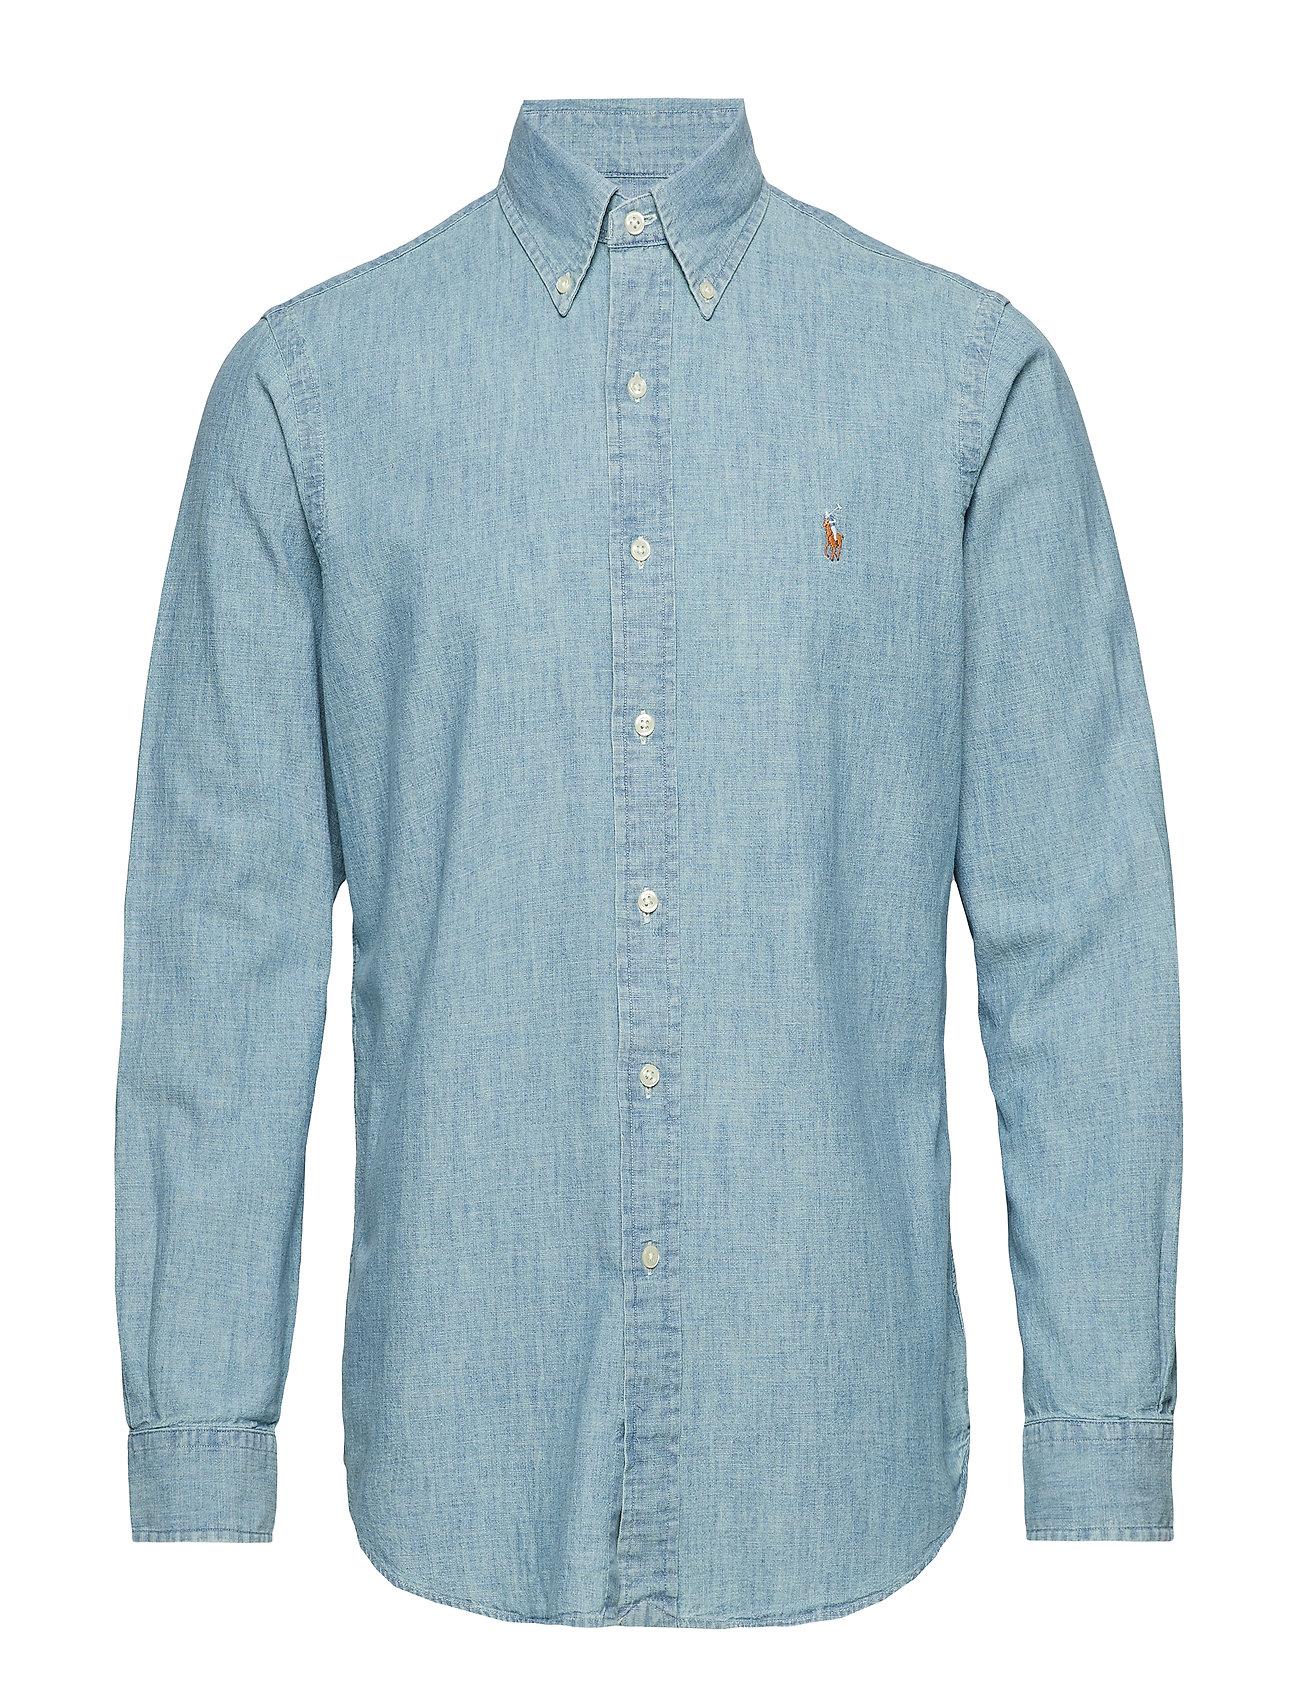 Polo Ralph Lauren Classic Fit Denim Sport Shirt - MEDIUM WASH